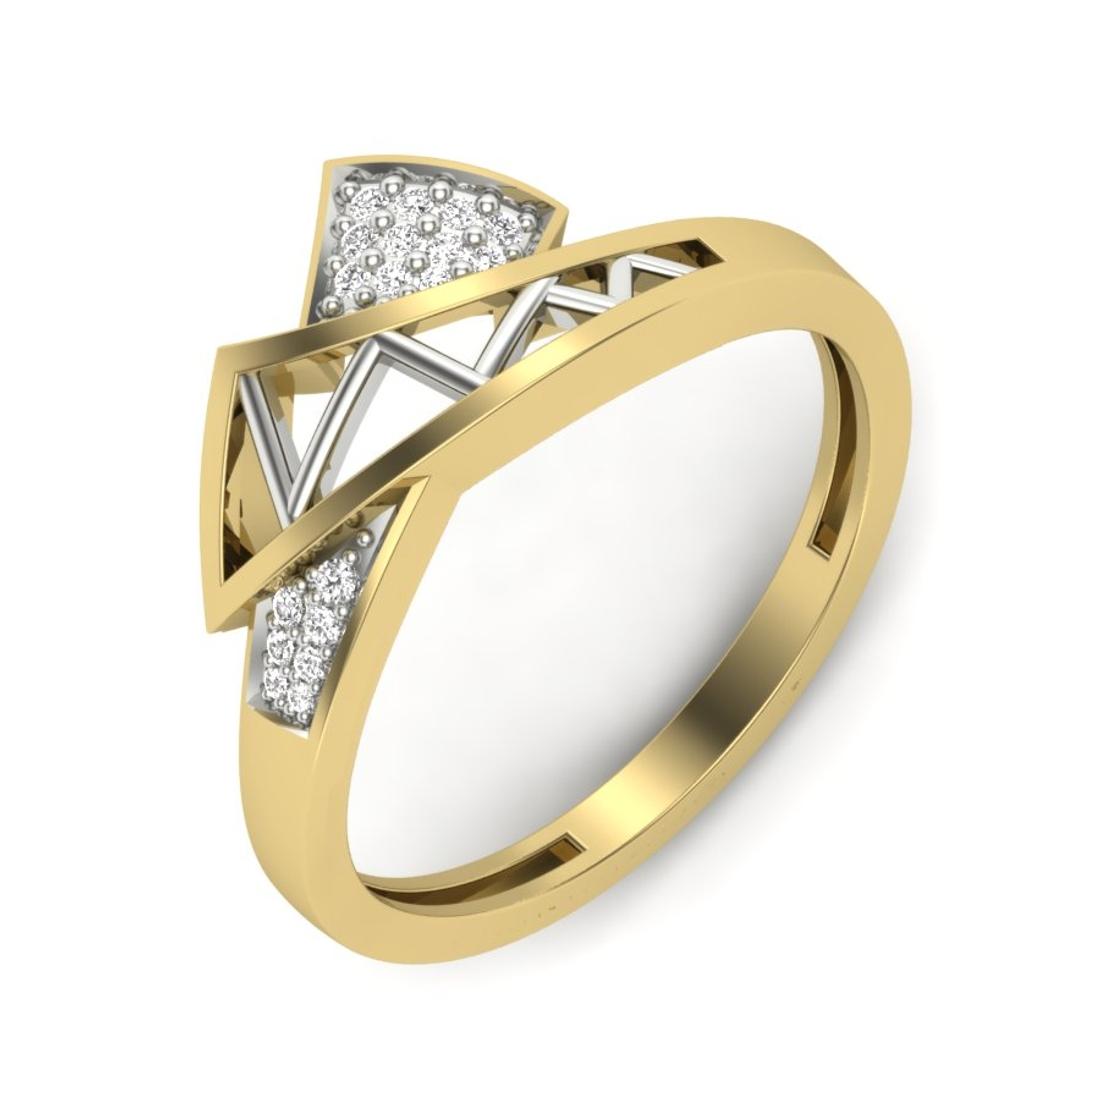 Lexa Designer Diamonds Engagement Ring